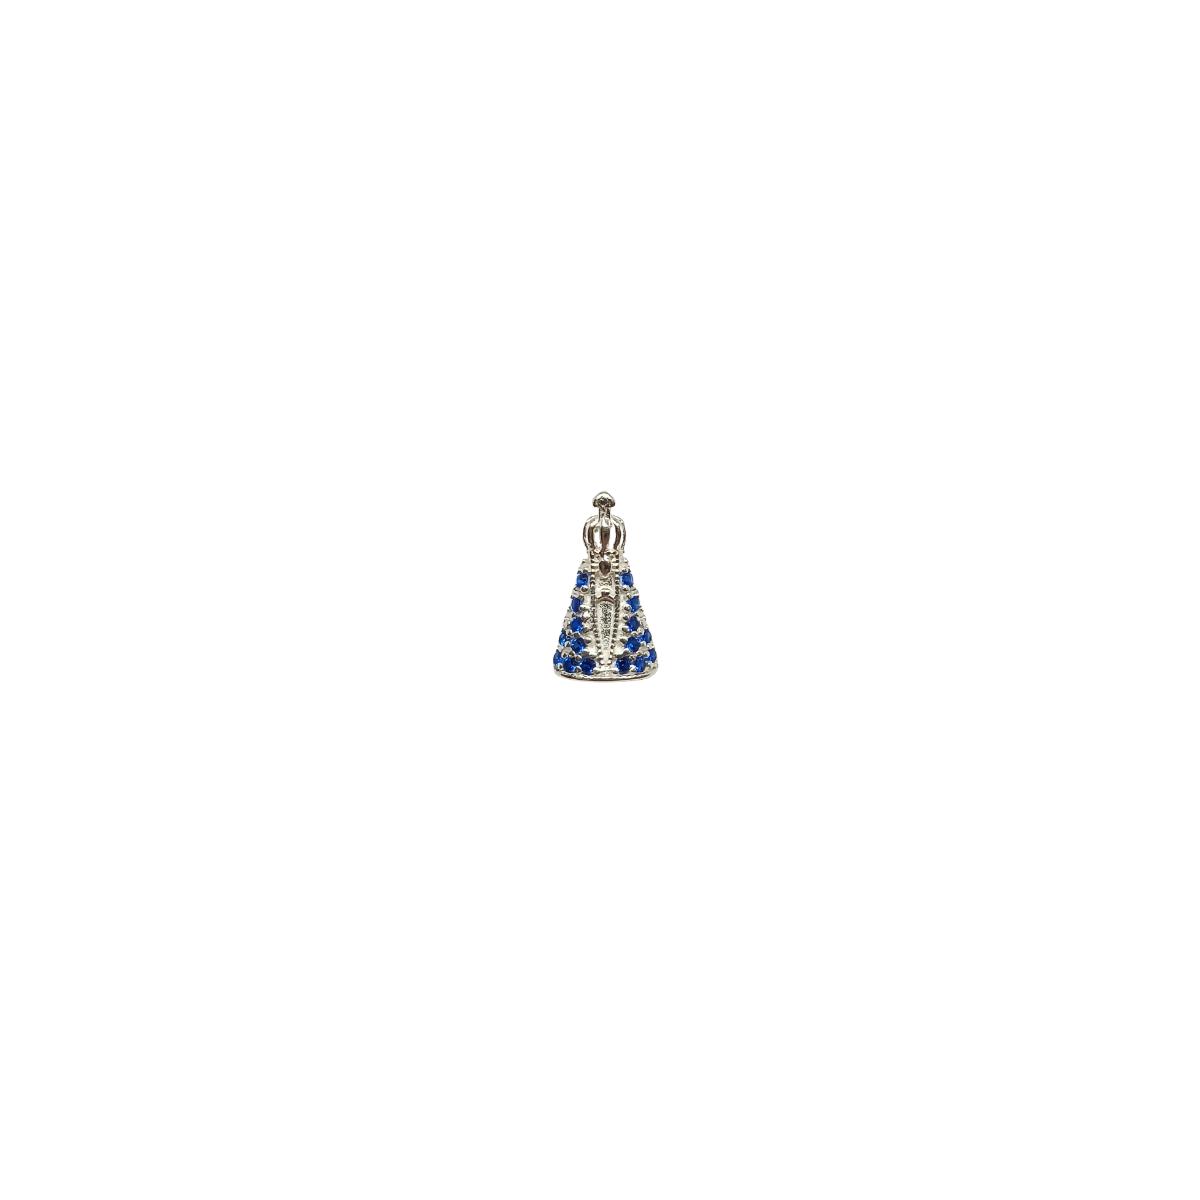 Colar Nossa Senhora Aparecida, Super delicada. Prata 925.